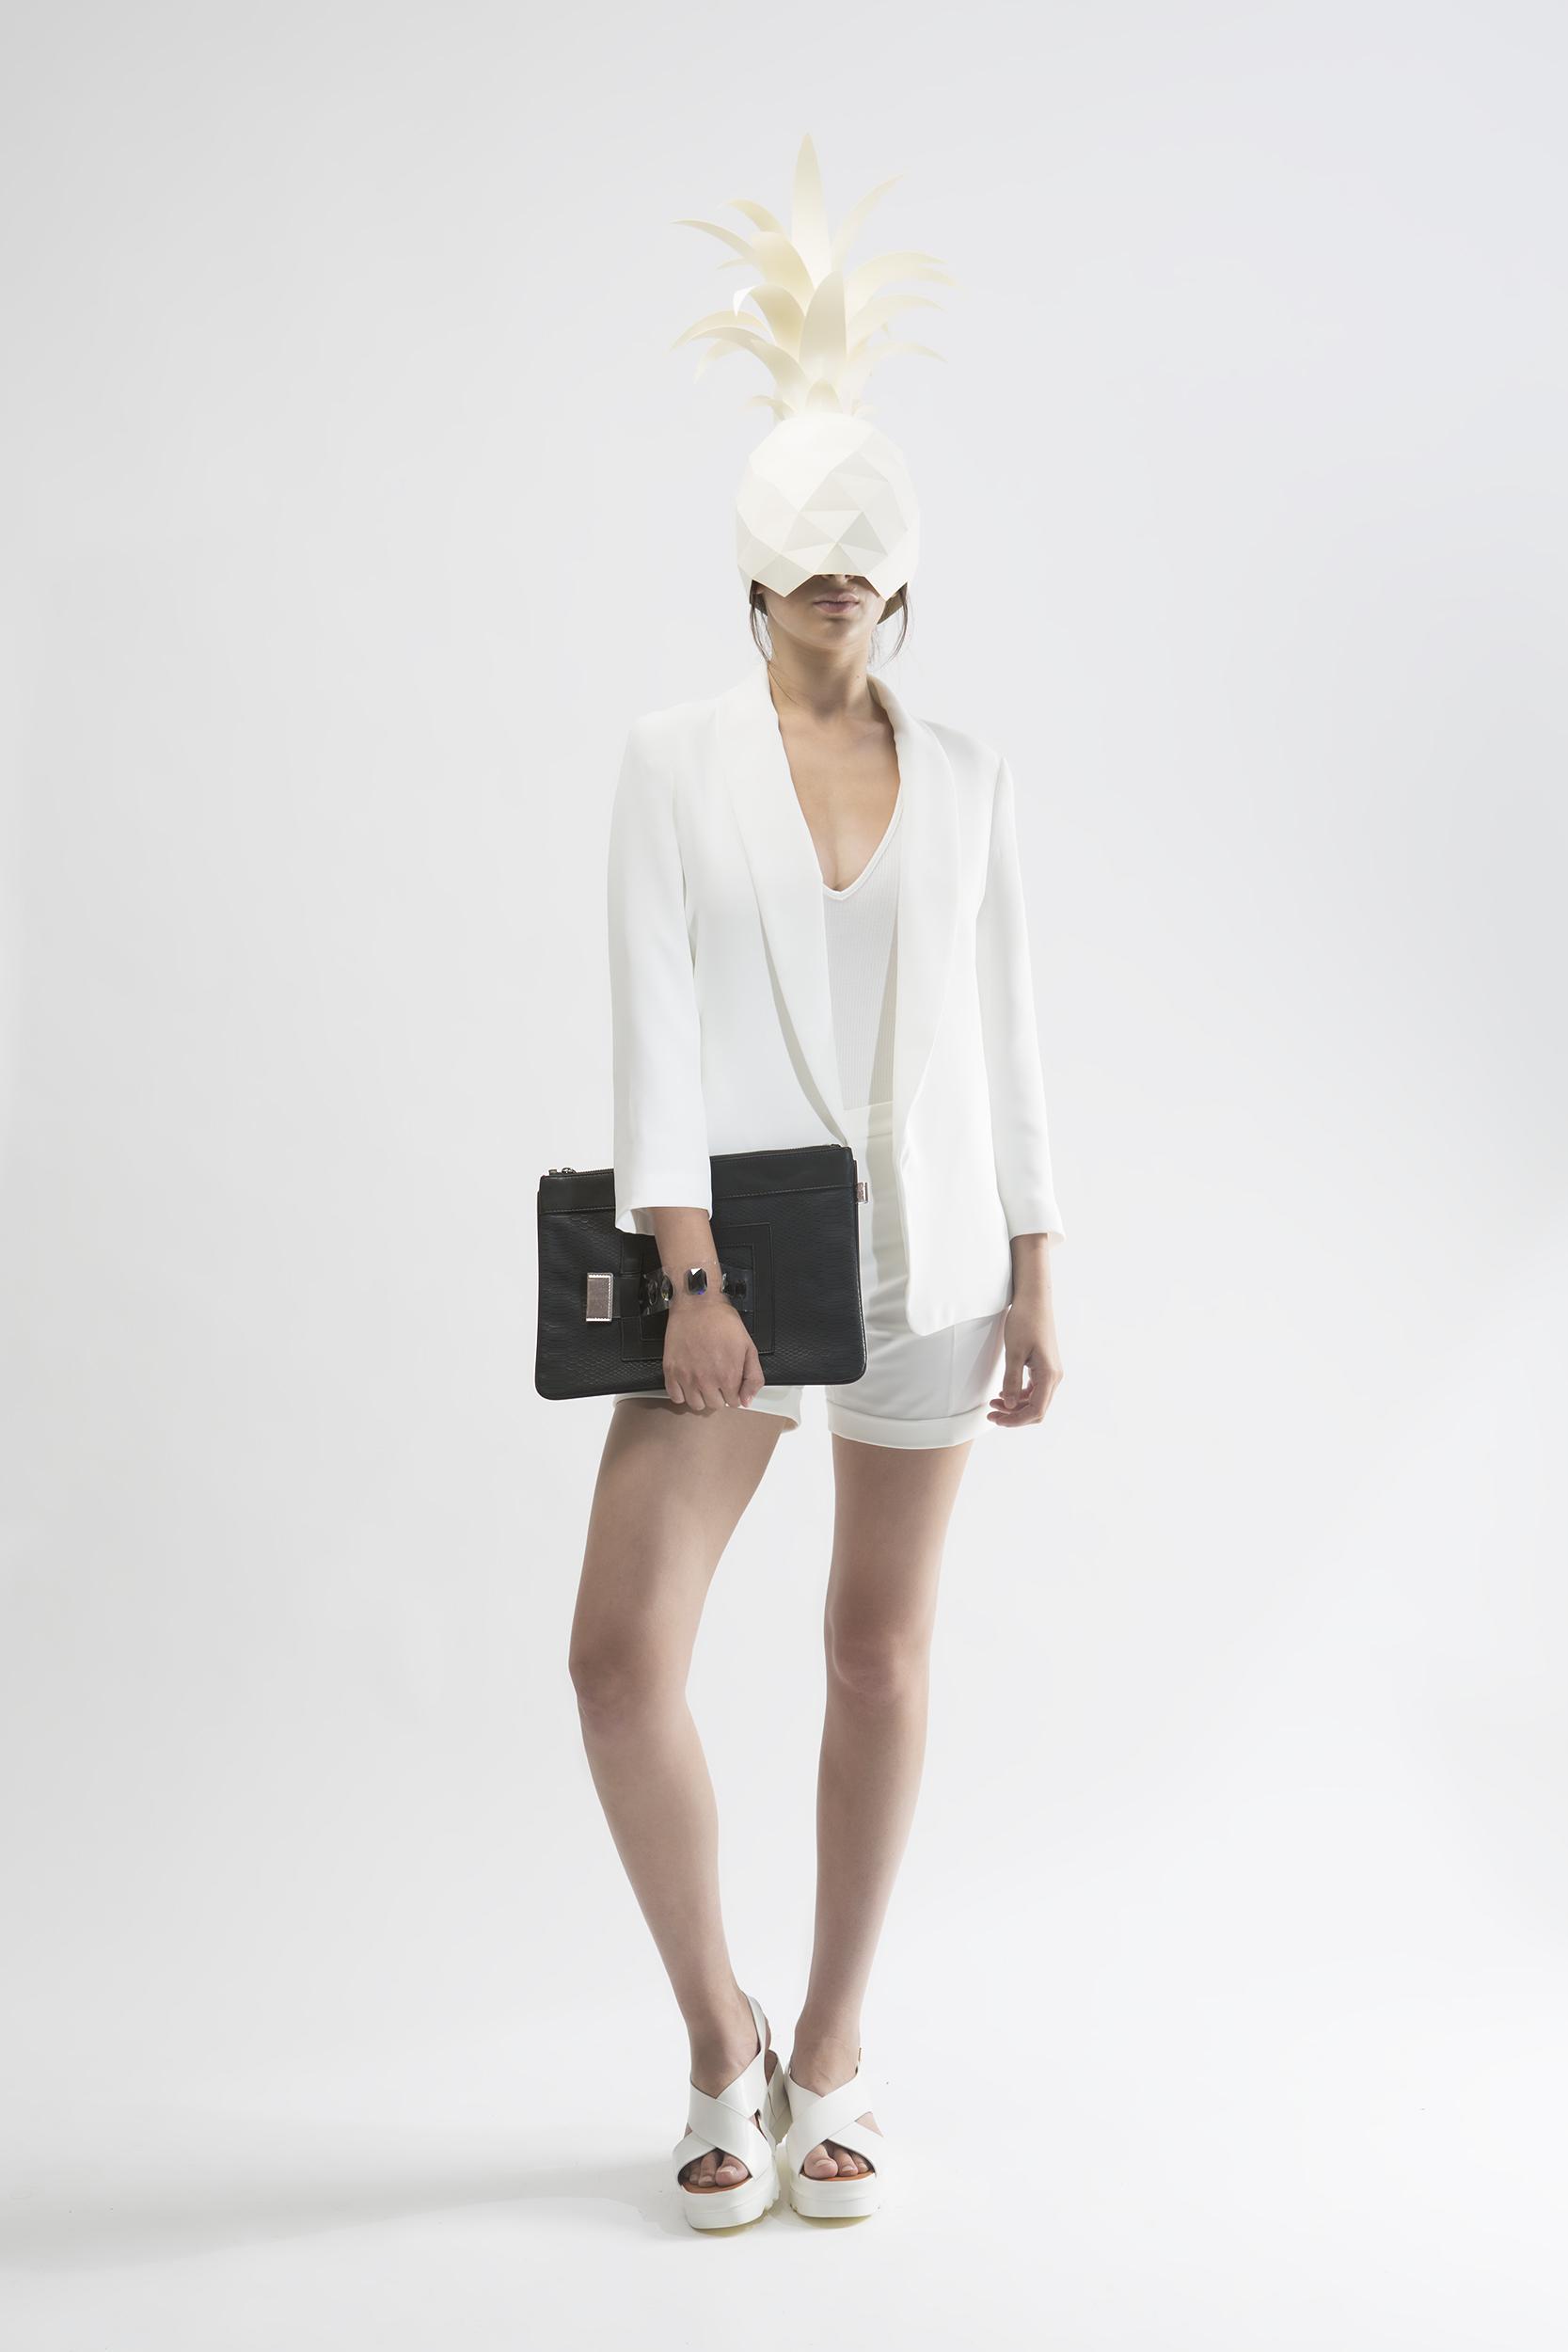 FruitenVeg-GEMA bag-never-leather-faux-exotic-skins-black-rhinestones-Ipad bag-bracelet-clutch-new-york-handbag-designer.